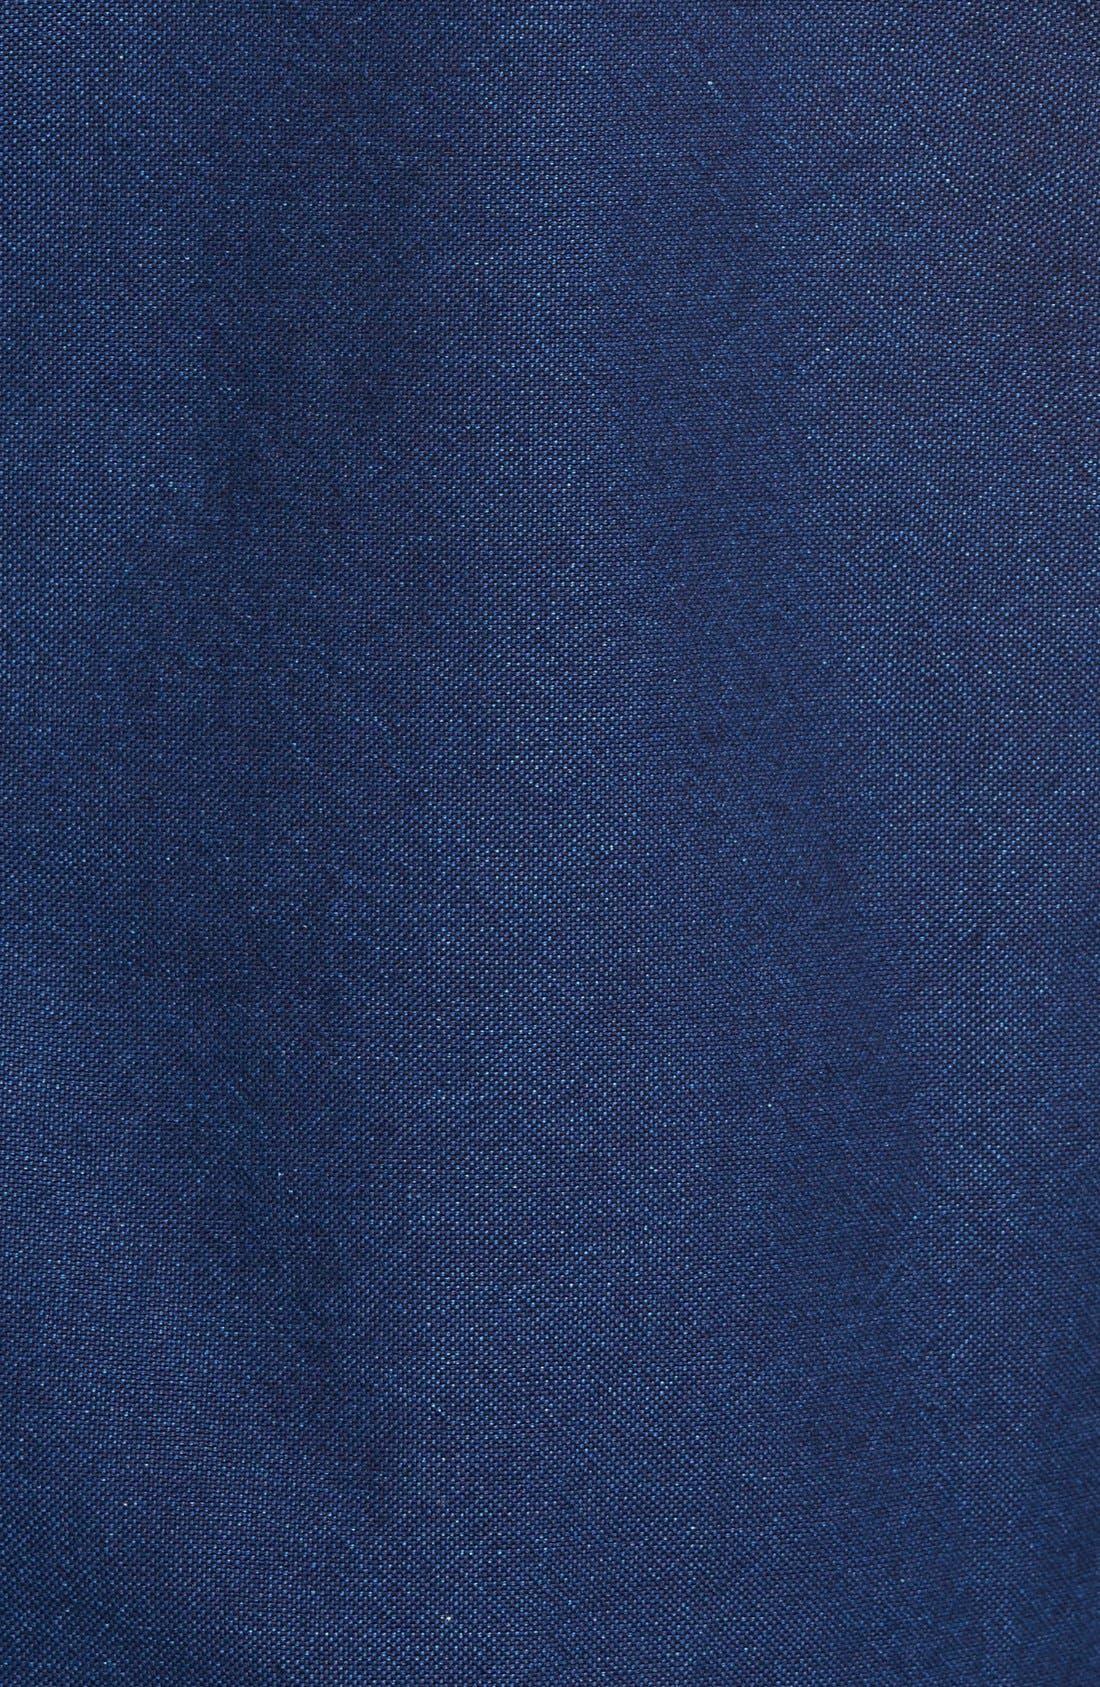 LUCKY BRAND,                             Denim Harrington Jacket,                             Alternate thumbnail 2, color,                             410